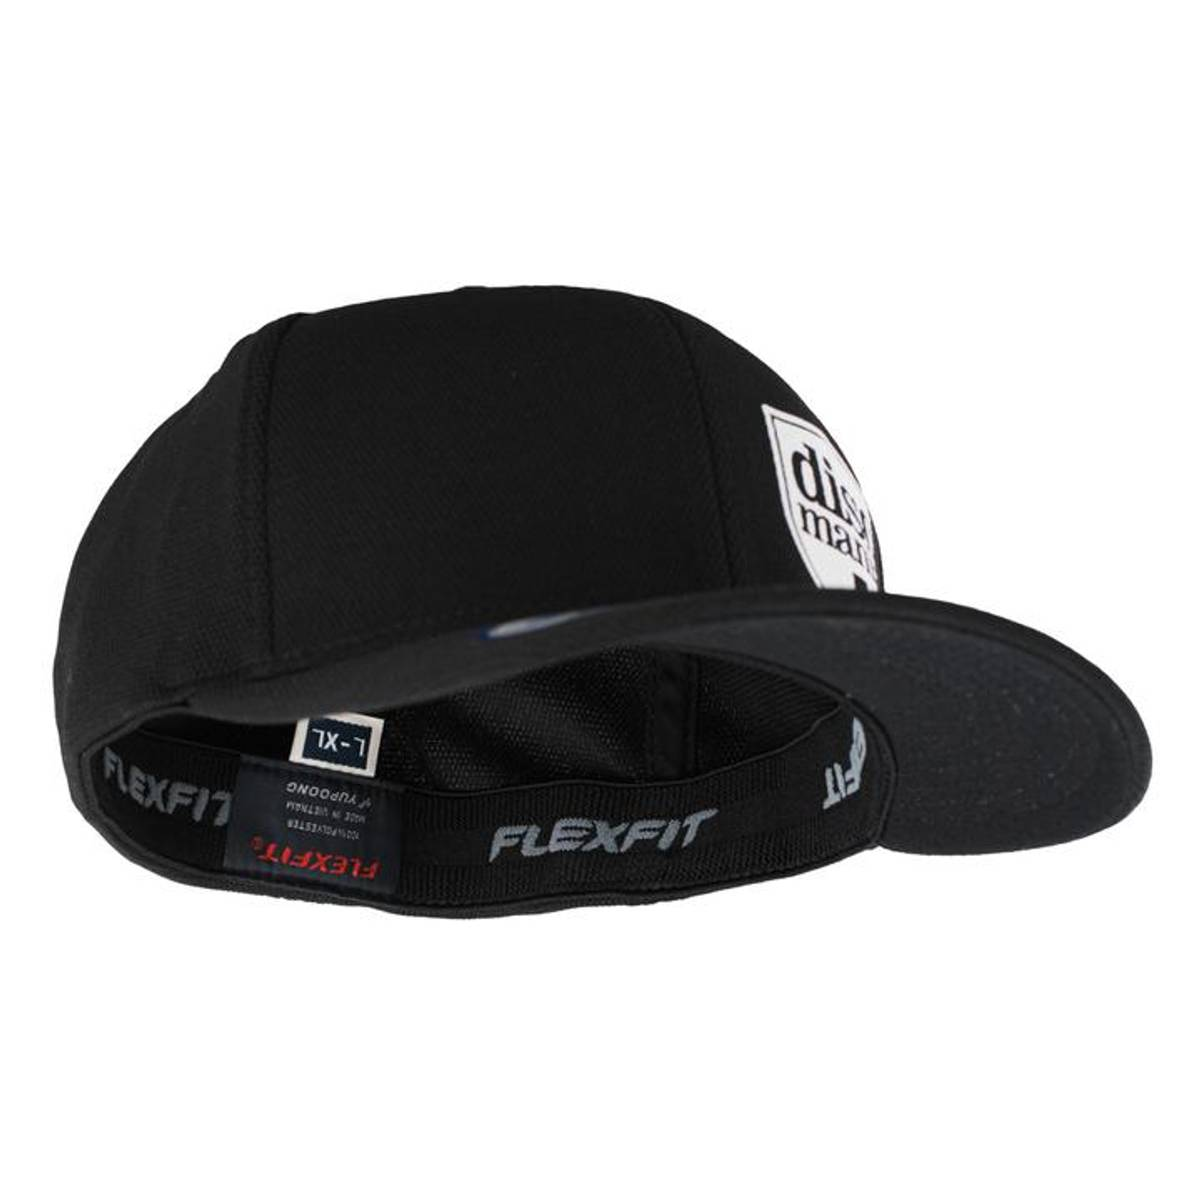 Discmania Shield Flexfit Hat